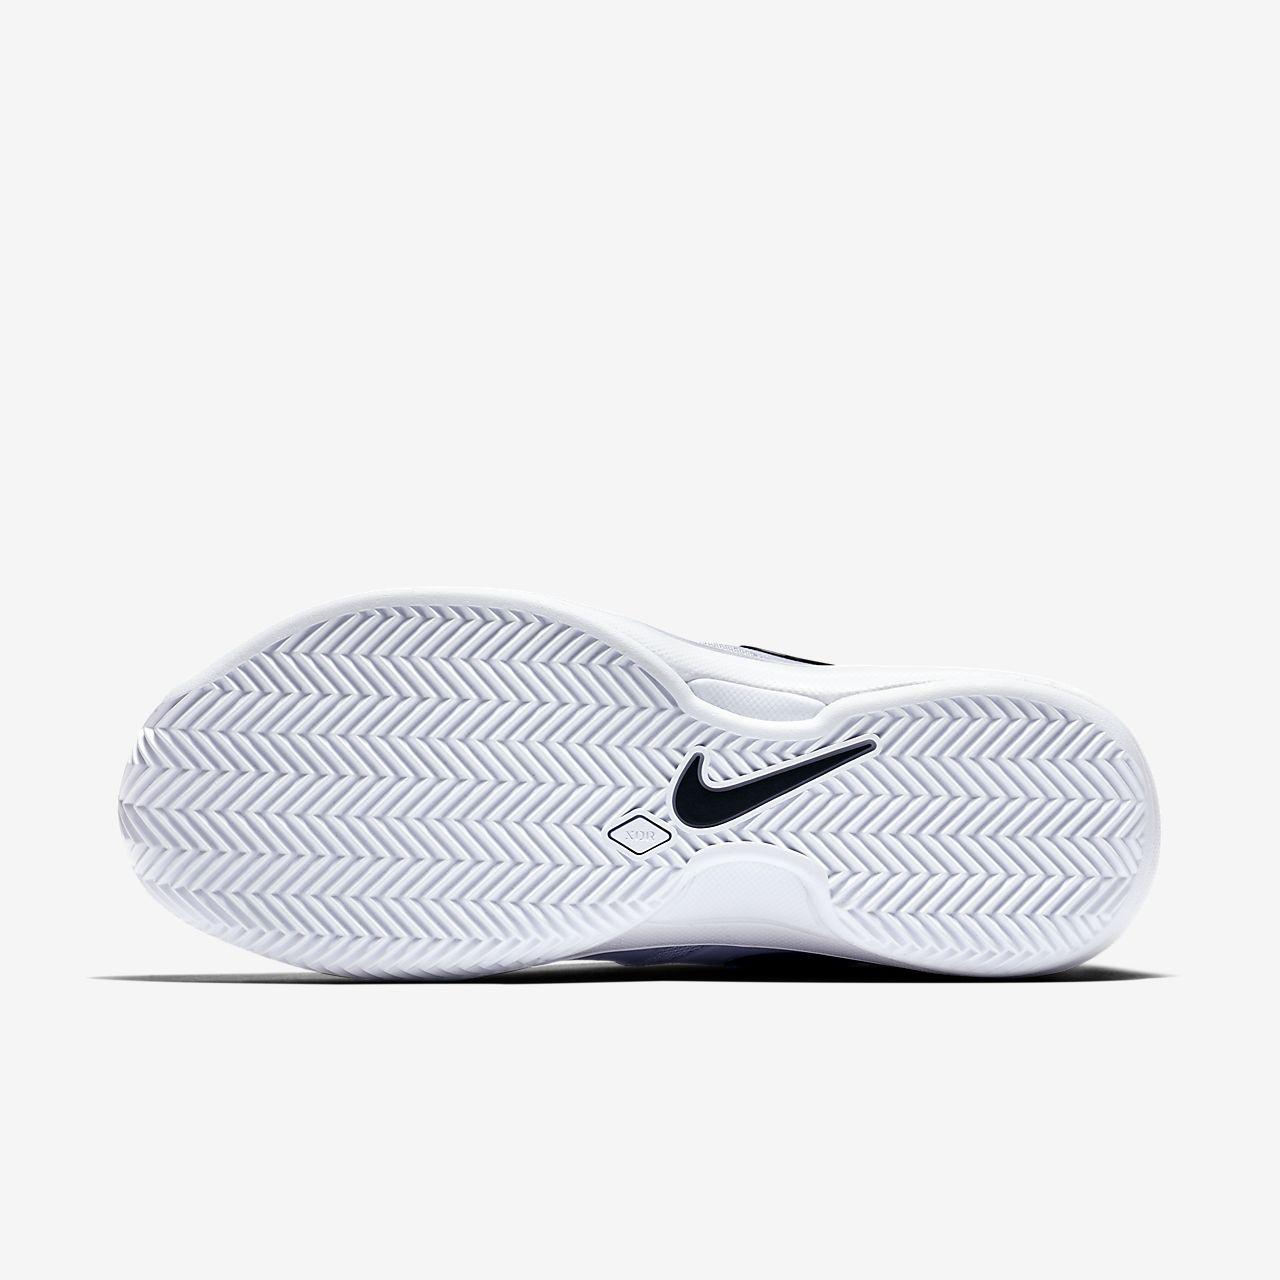 sports shoes bc1bd 3132f Nike Air Zoom Prestige Clay Zapatillas de tenis - Mujer. Nike.com ES